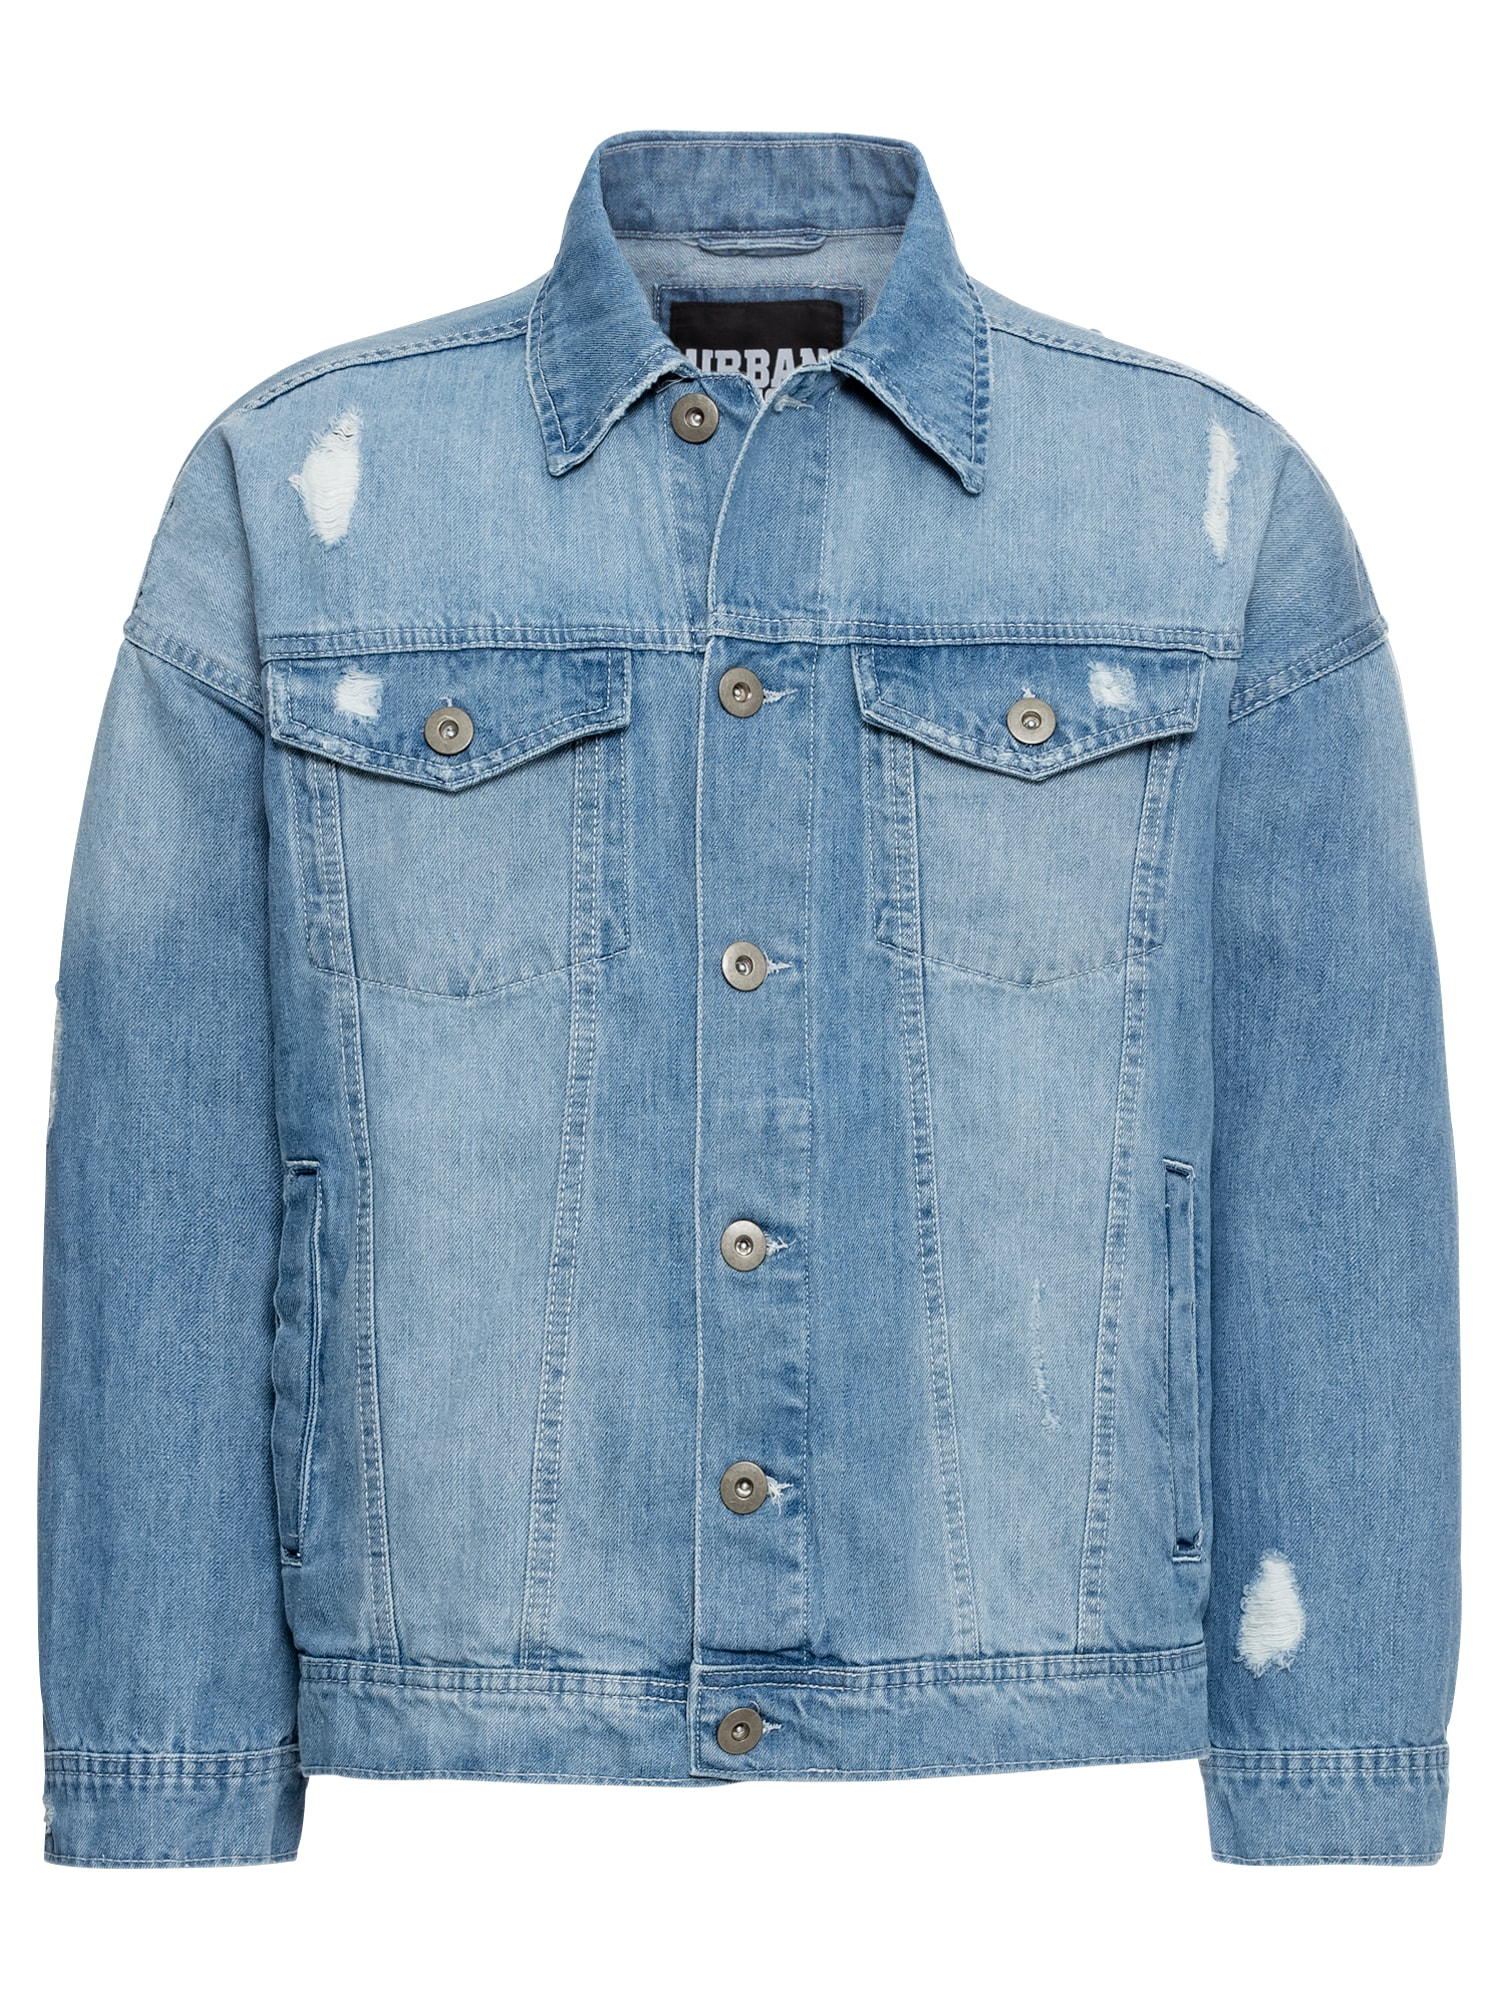 Rabatt-Preisvergleich.de - Männer   Bekleidung   Jacken   Jeansjacken b87412842c